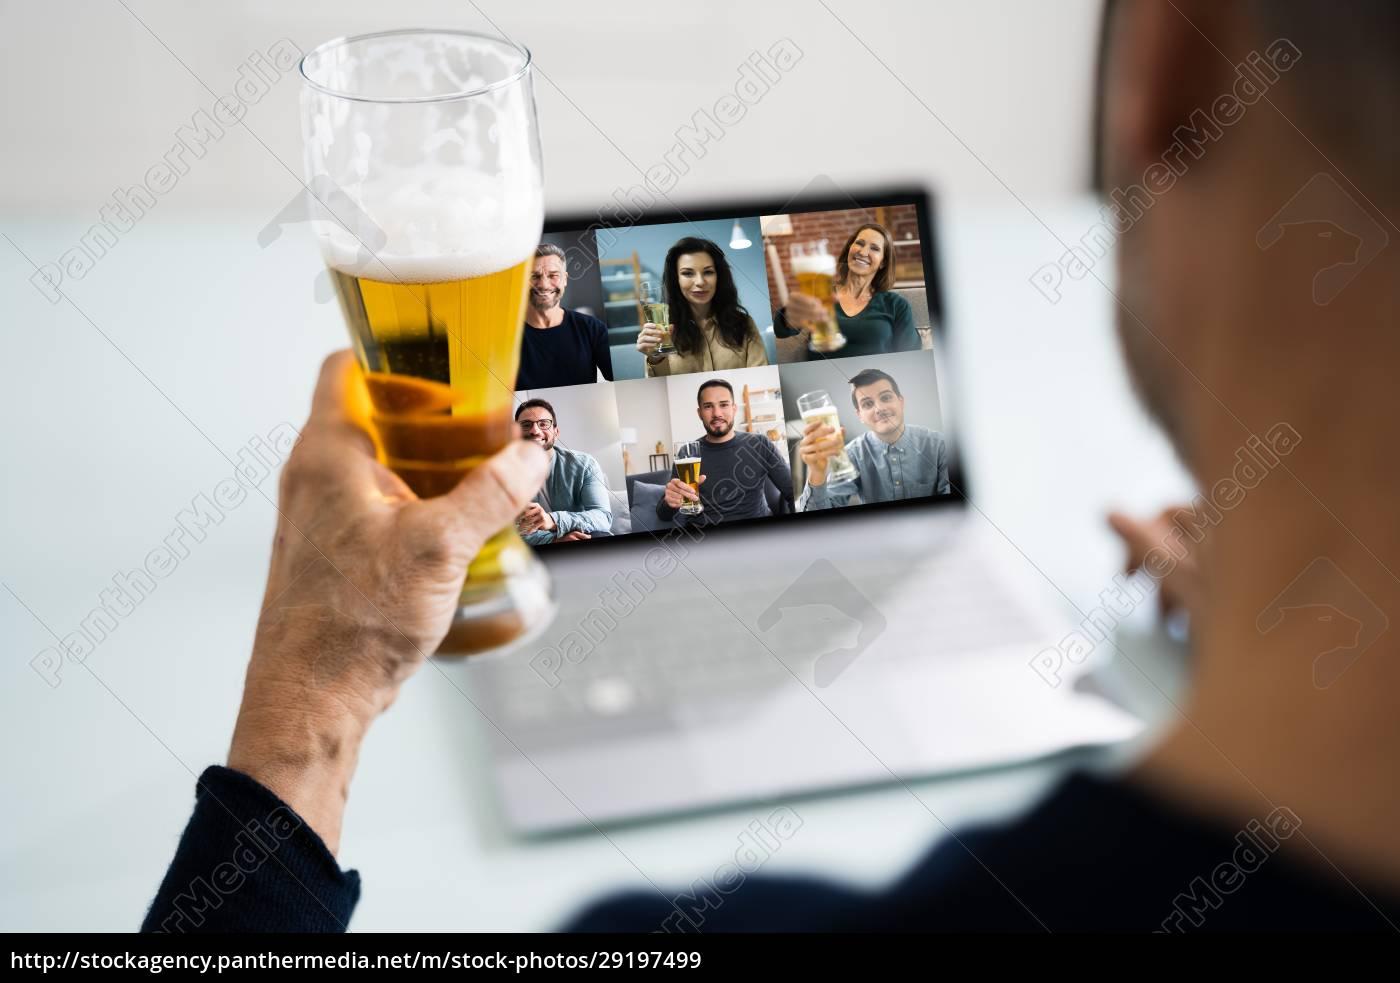 festa, online, da, bebida, virtual, beer - 29197499